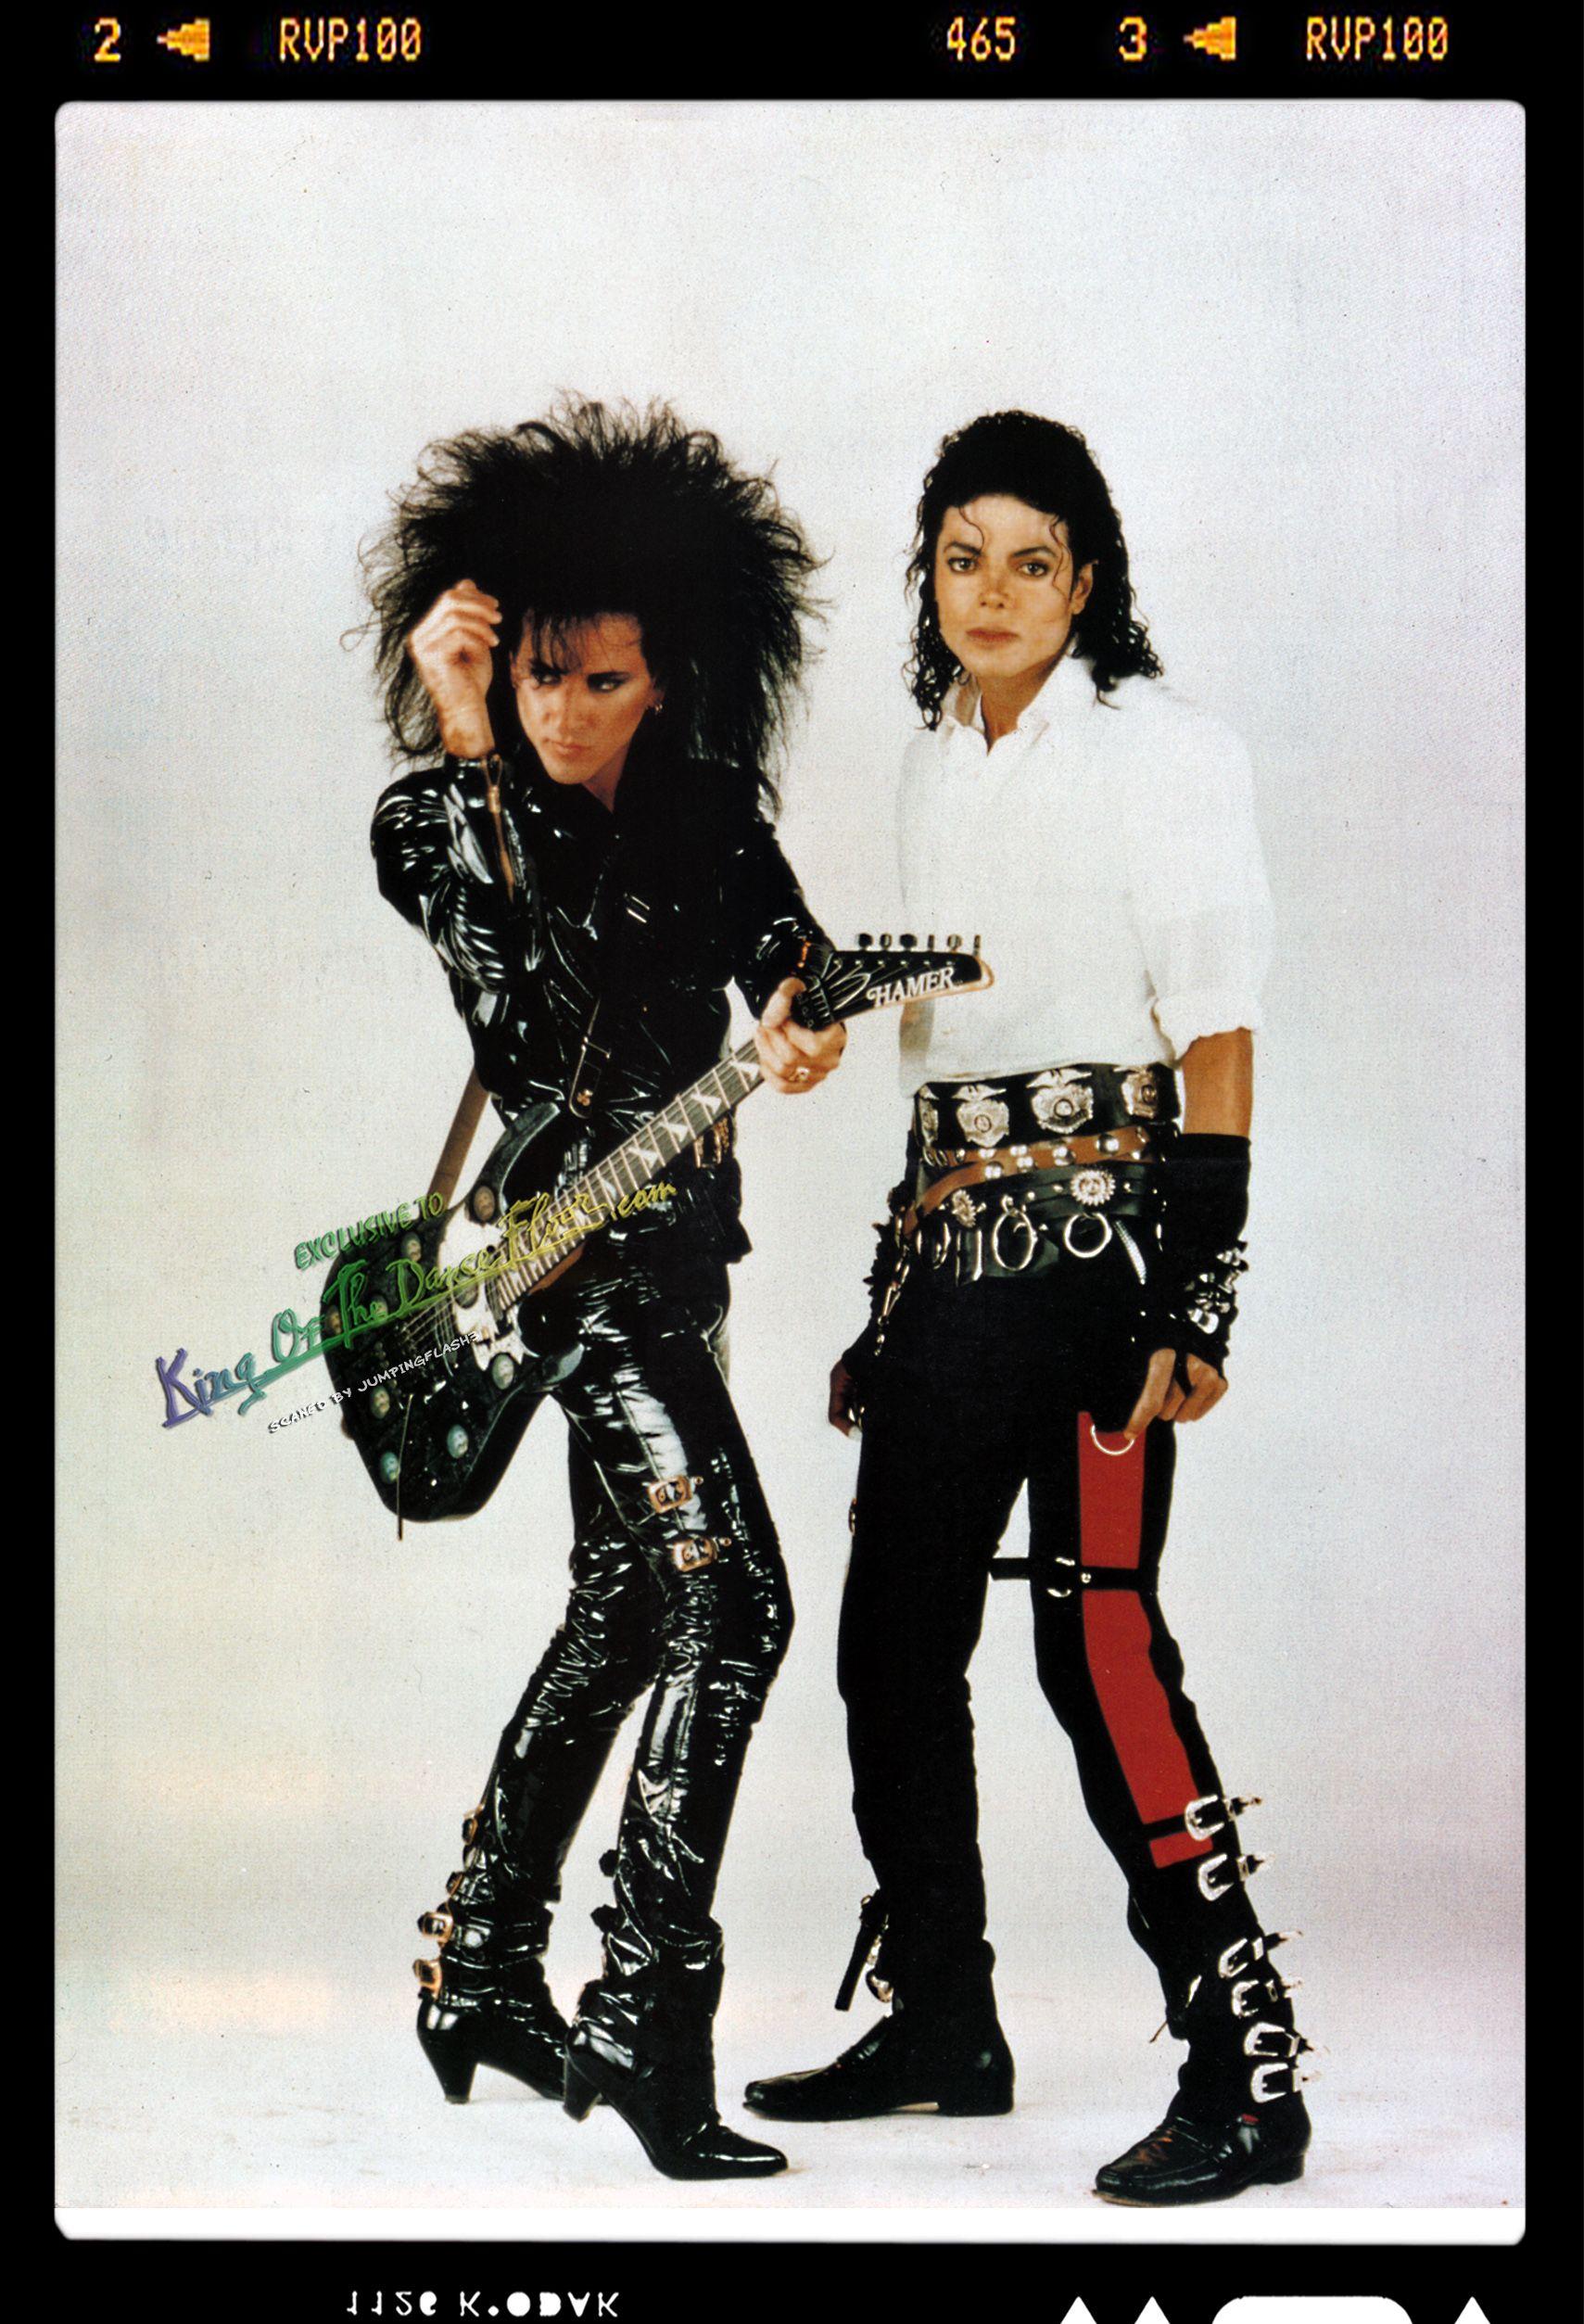 Steve Stevens With Michael Jackson At The Top Of Their Game Michael Jackson Michael Jackson 1987 Michael Jackson Bad Era